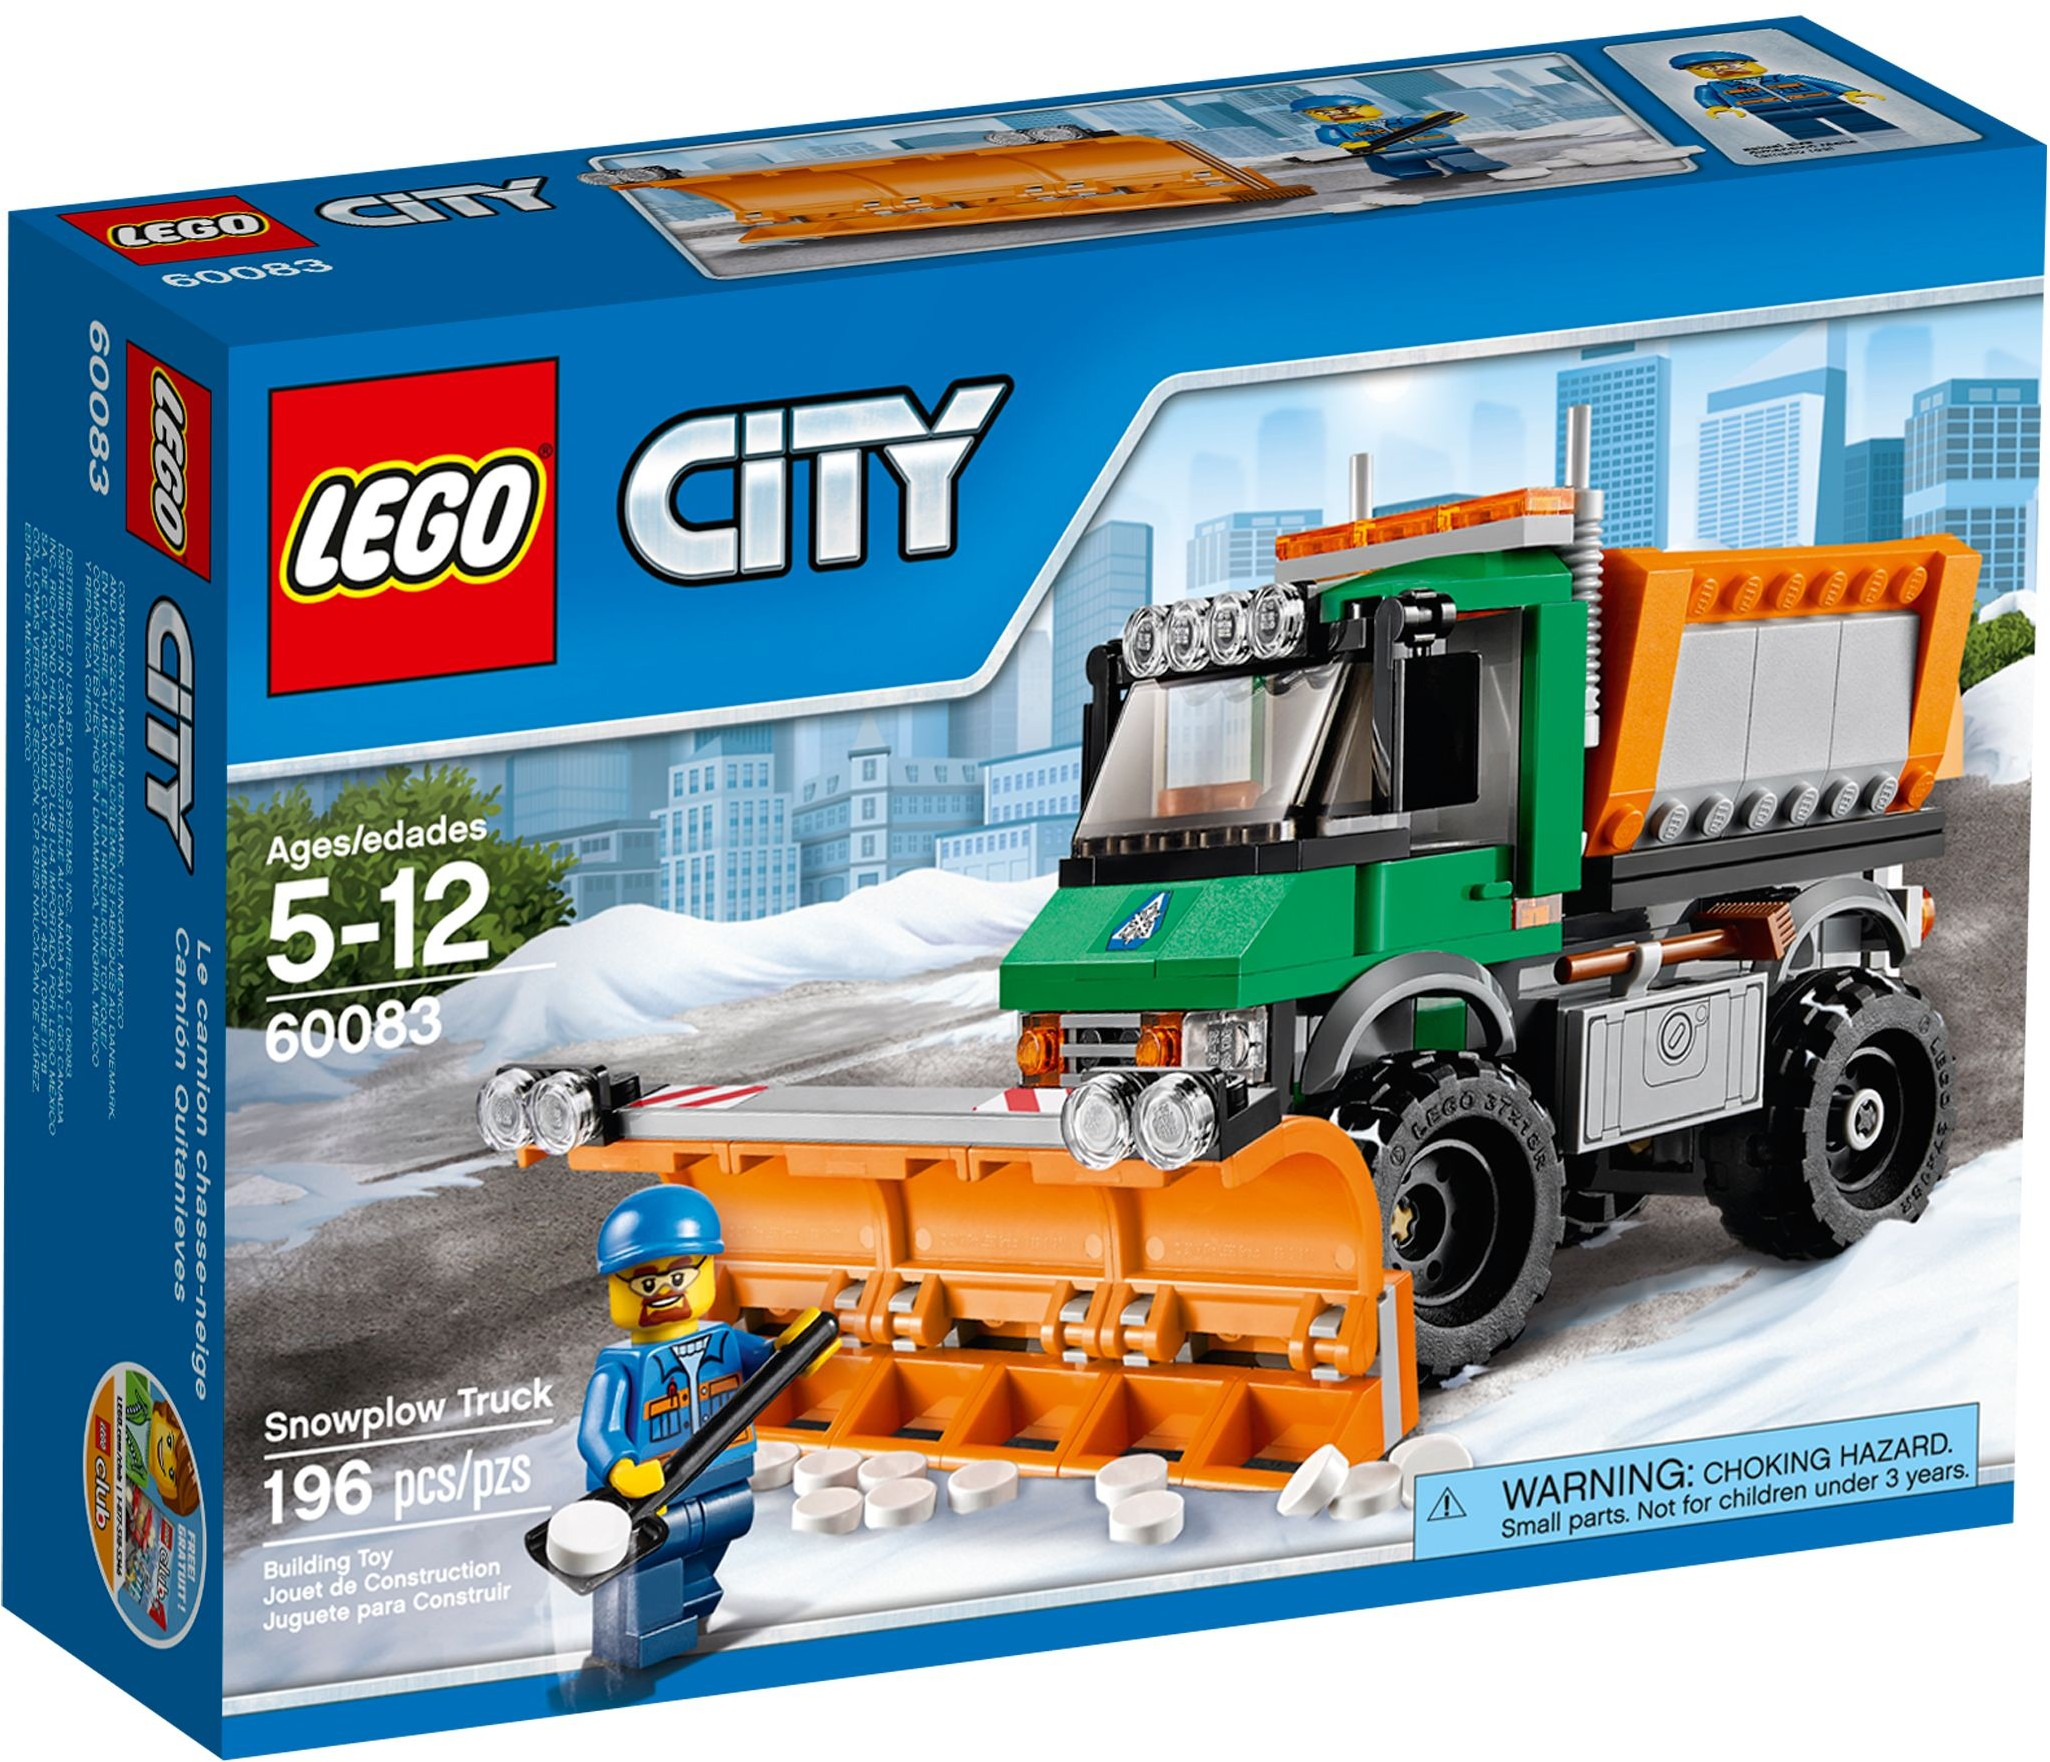 60083 LEGO® City Snowplough Truck